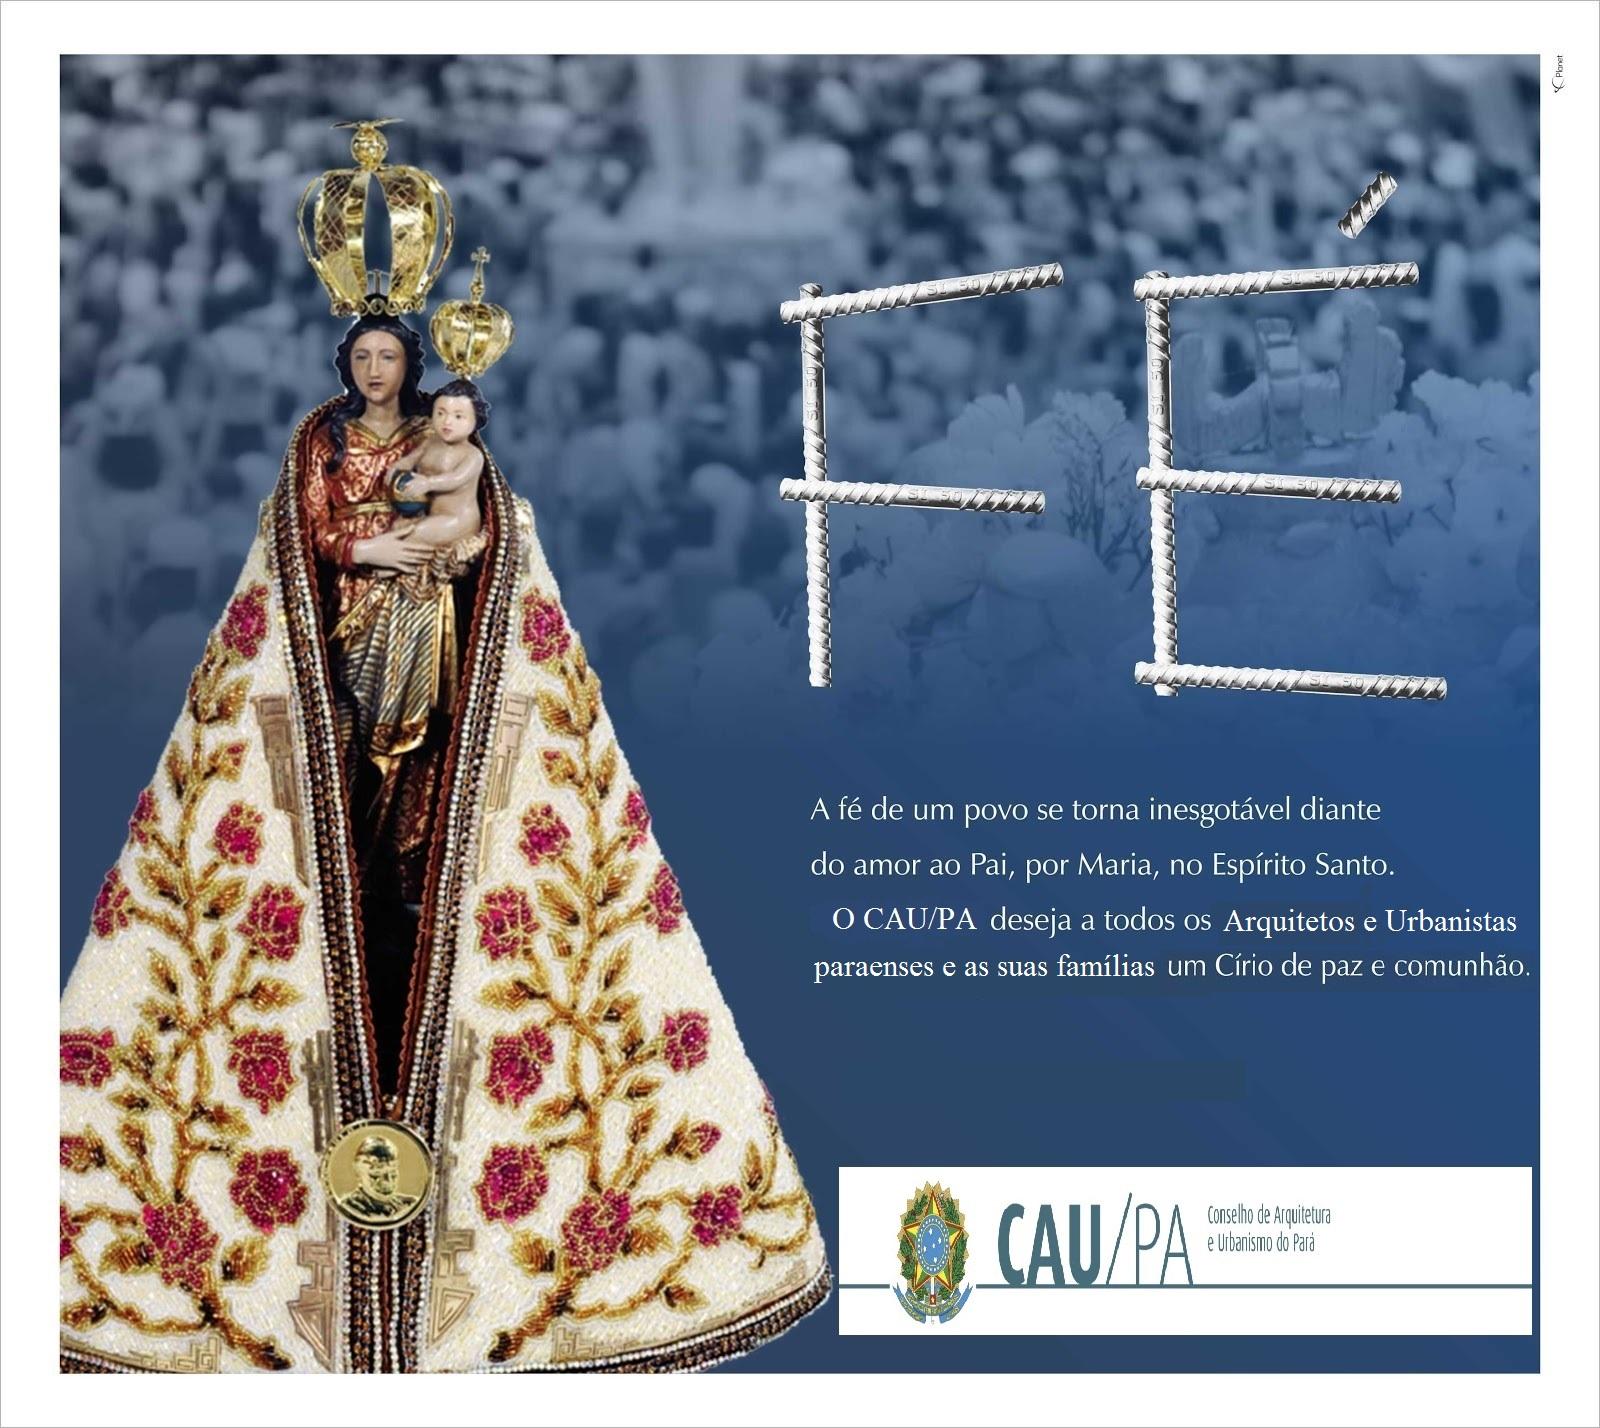 Anuncio Cirio 2012 - CAU/PA